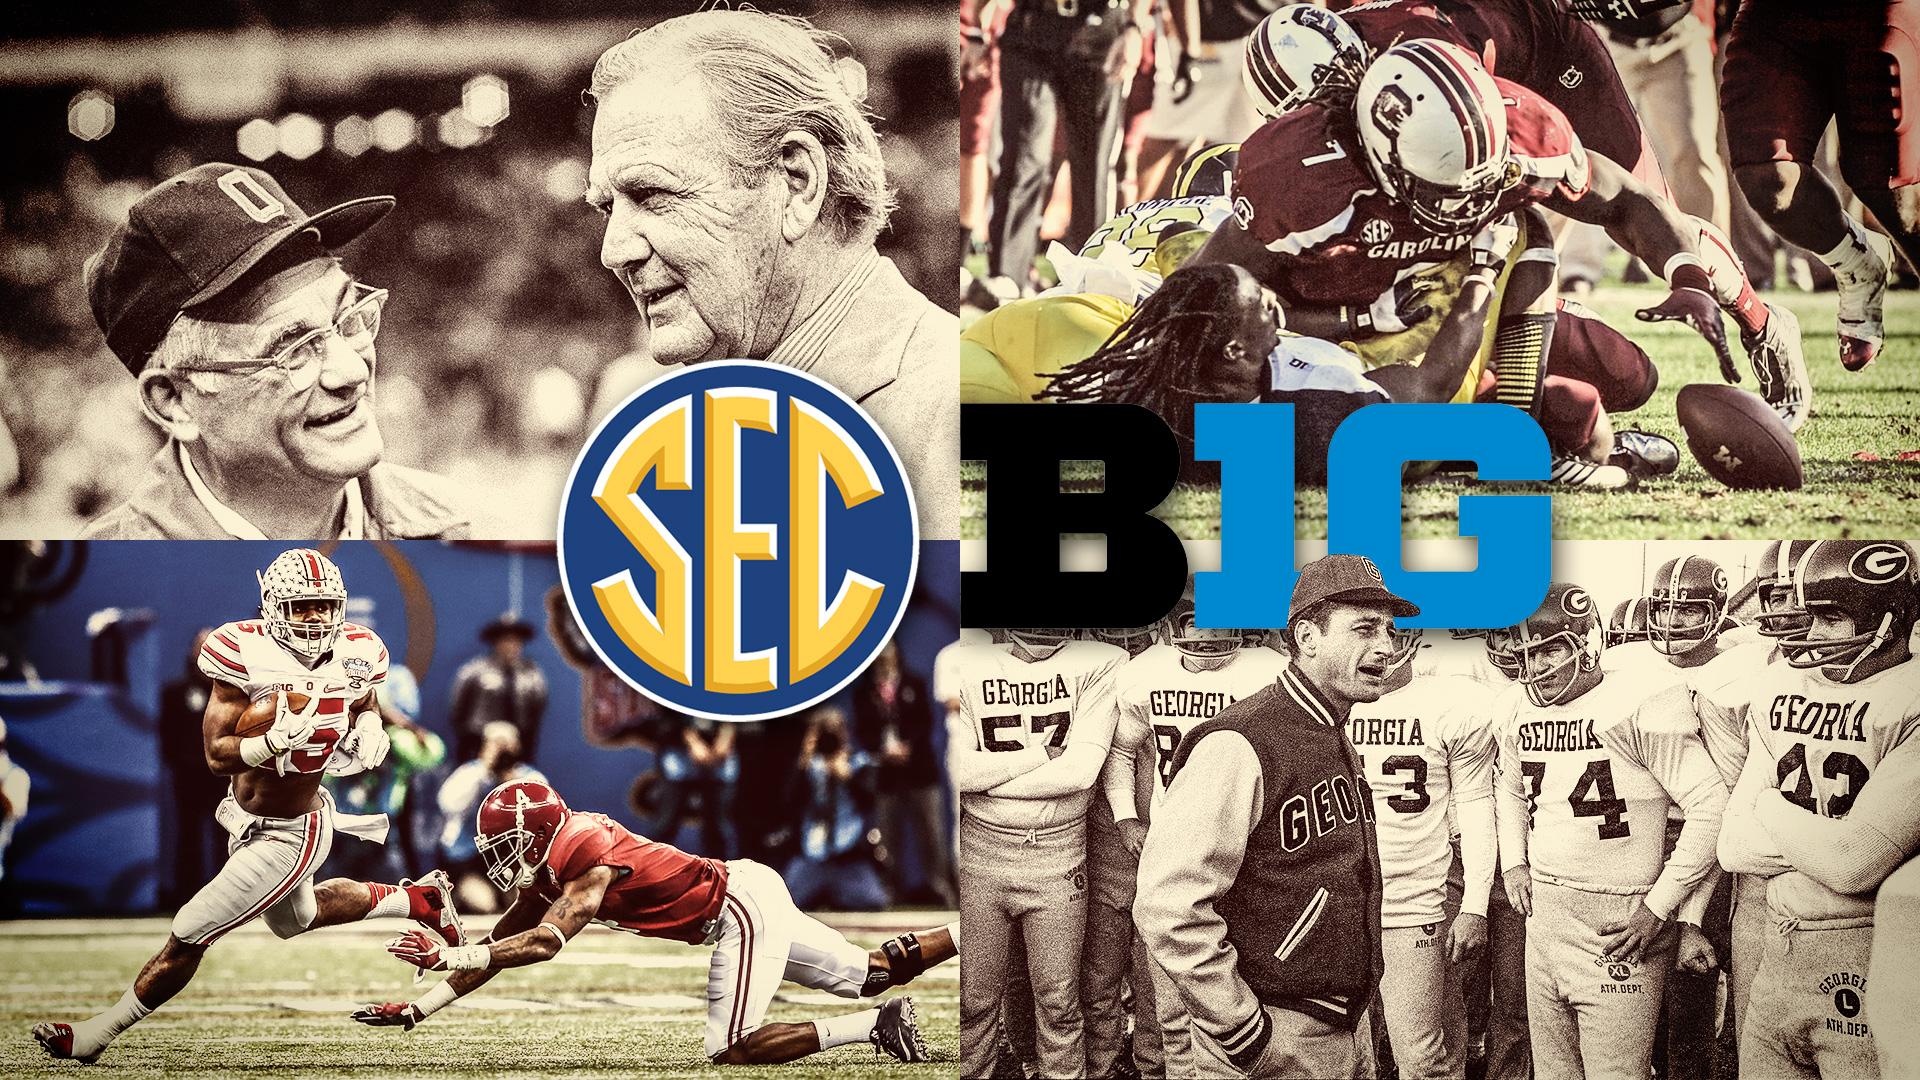 SEC-Big-10-rivalry-082715-AP-GETTY-FTR.jpg